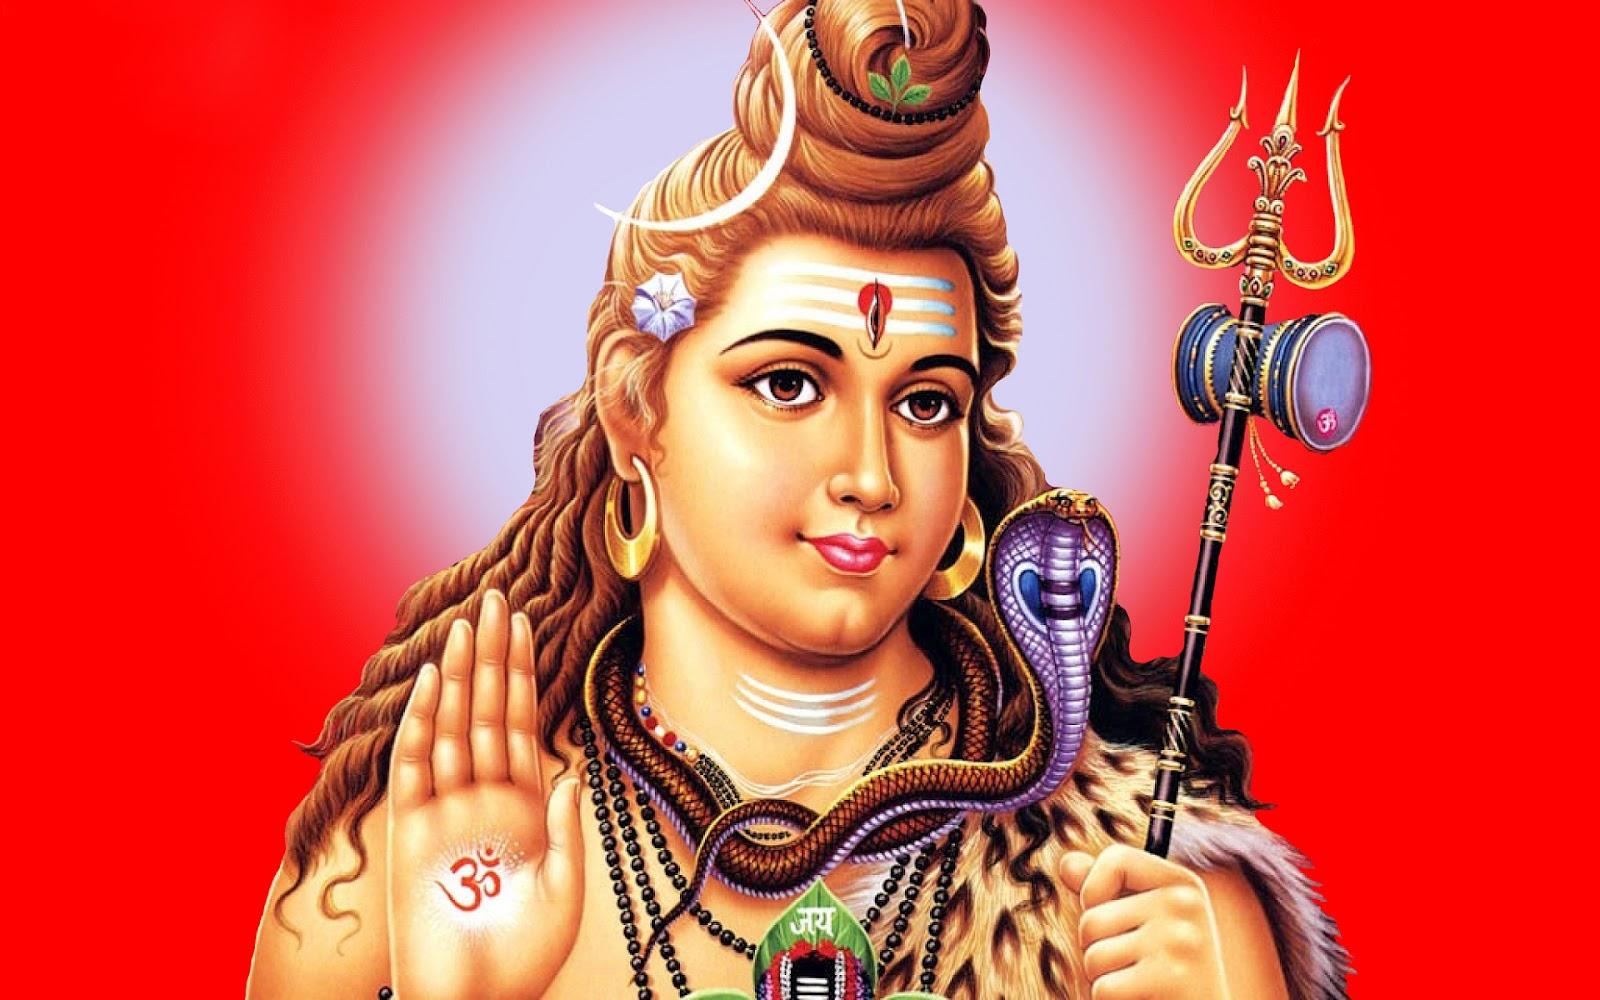 Bhakti Wallpaper 3d Hd Download Lord Shiva Wallpaper And Beautiful Images Hd Wallpapers